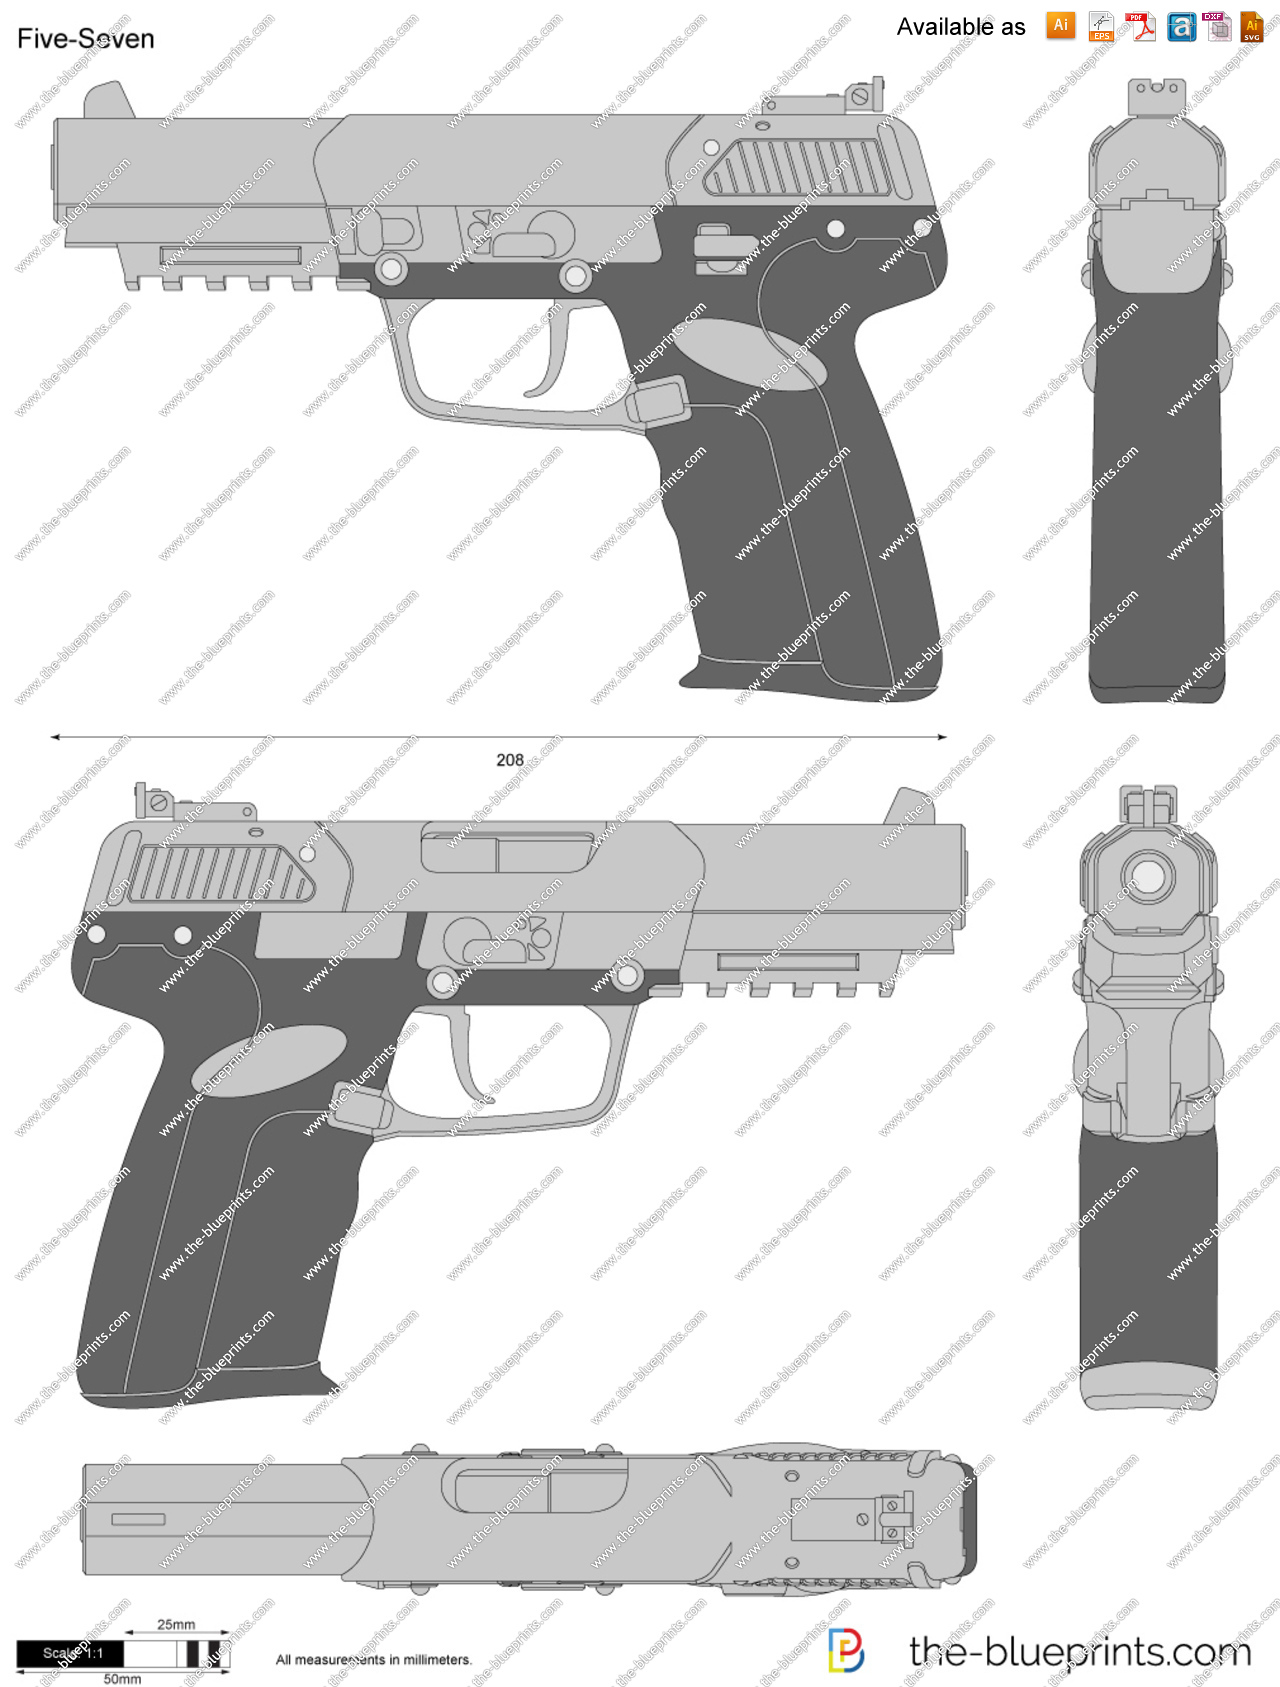 Five seven clipart. Vector drawing